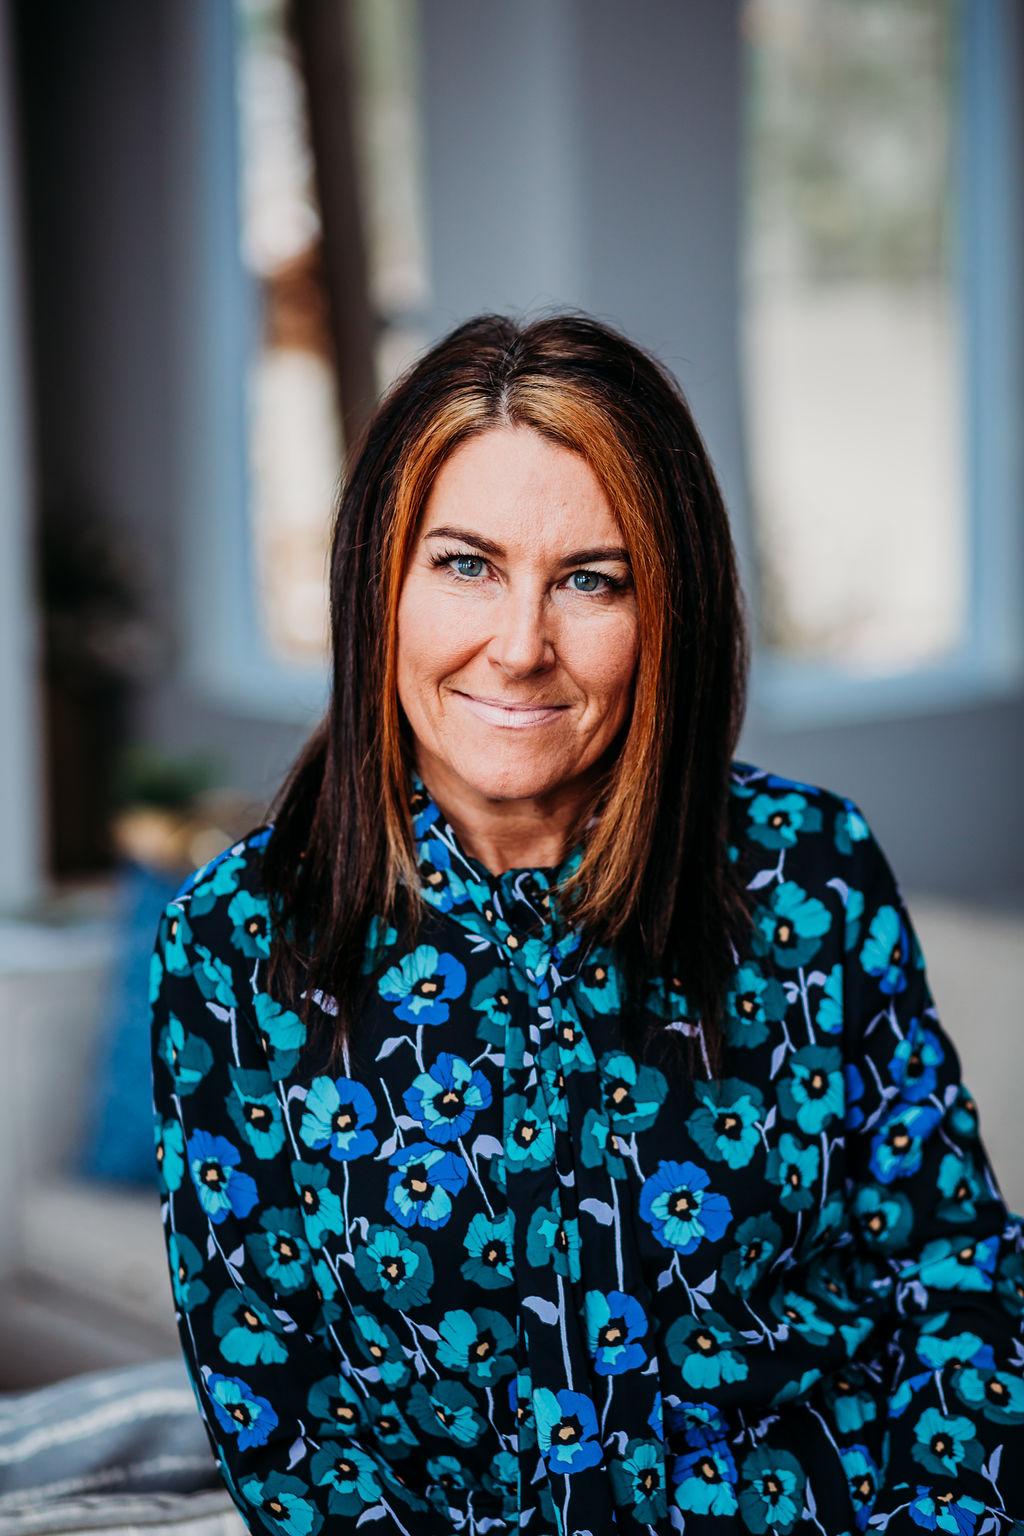 Developing emotional intelligence - Author and Speaker, Kimberley Behnan